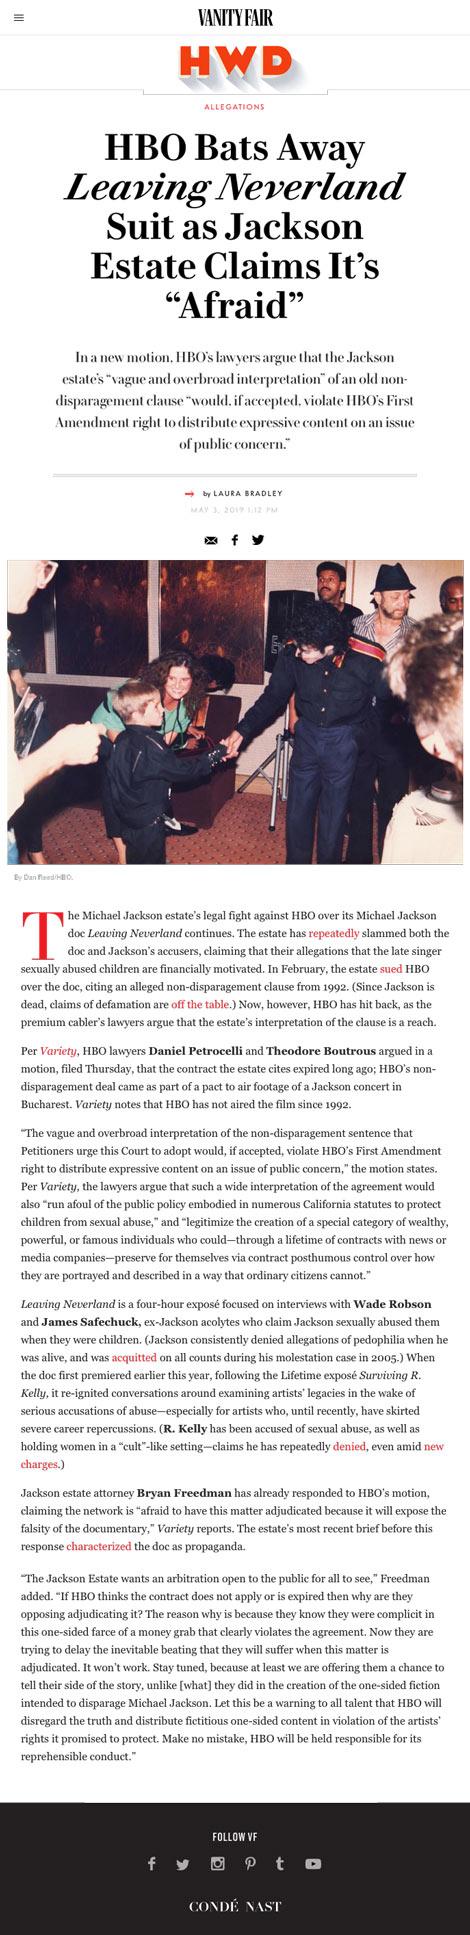 "HBO Bats Away Leaving Neverland Suit as Jackson Estate Claims It's ""Afraid"" - article by VanityFair.com"